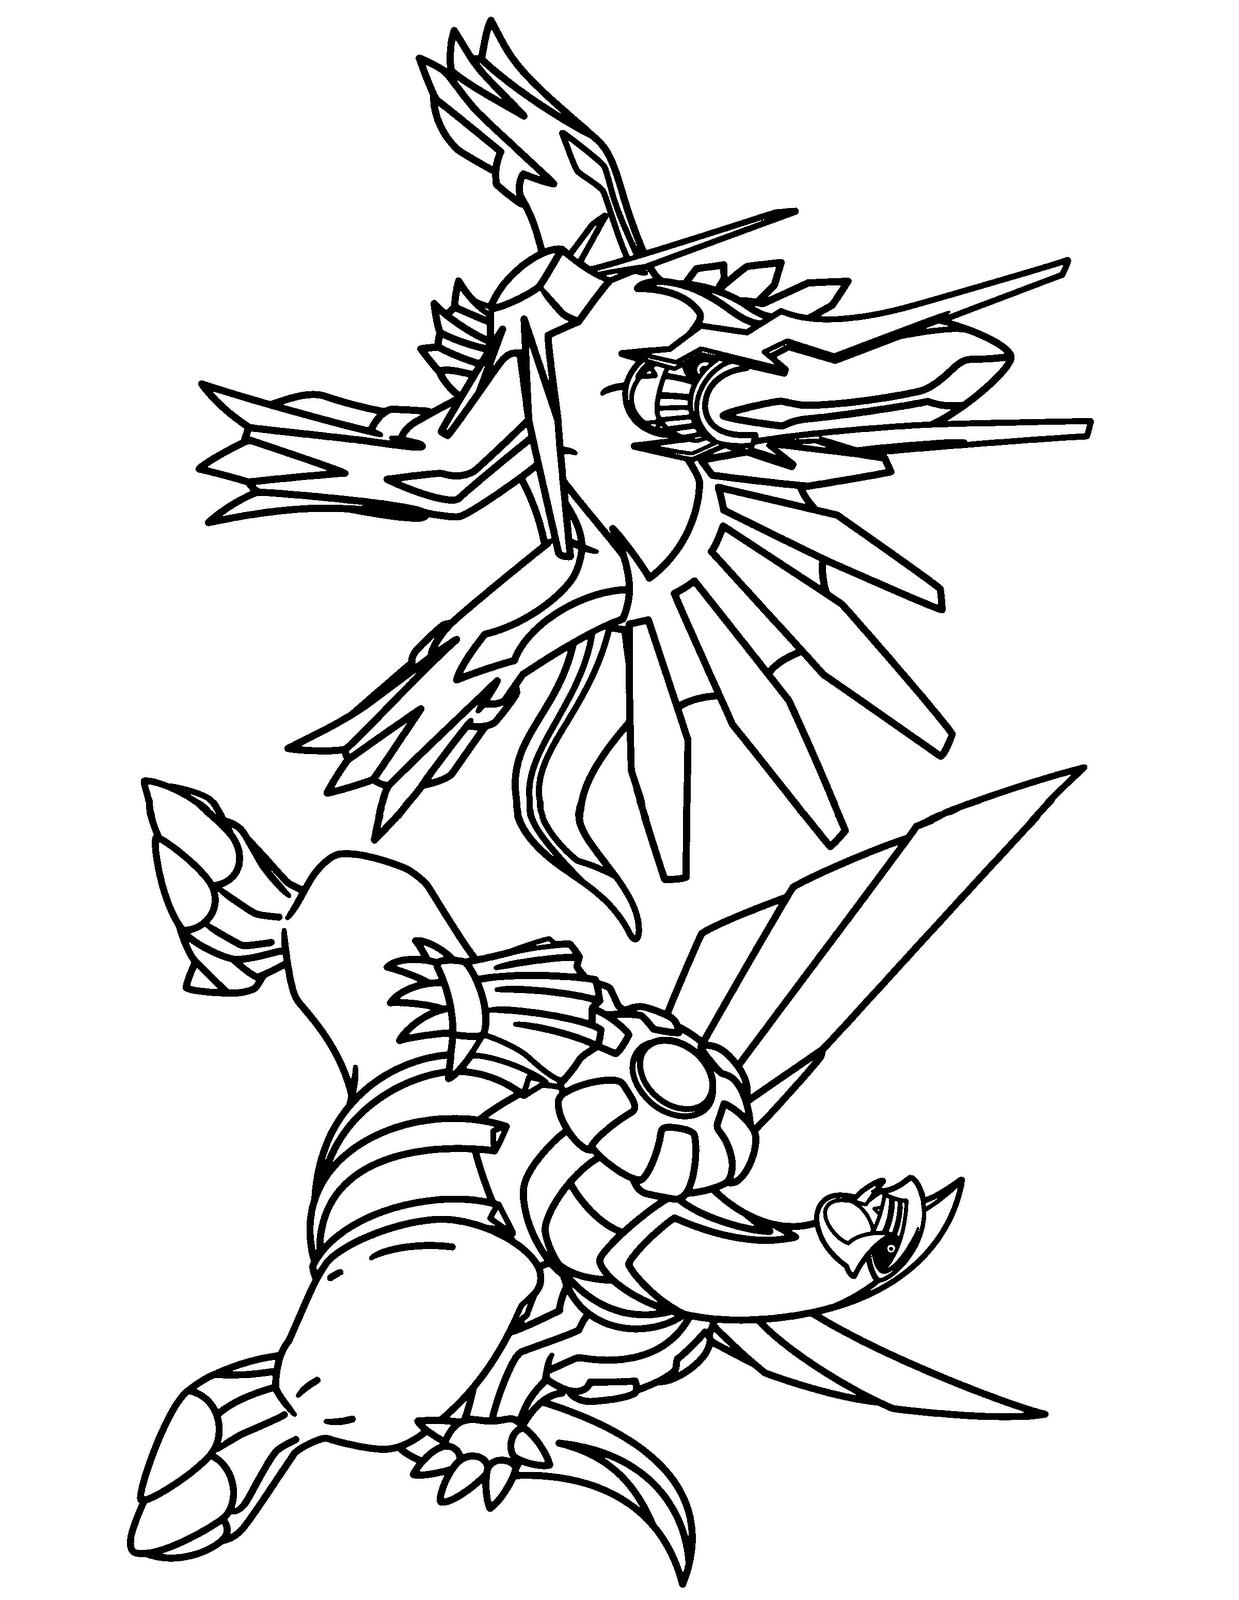 Desenhos para colorir - Coloriage pokemon palkia ...